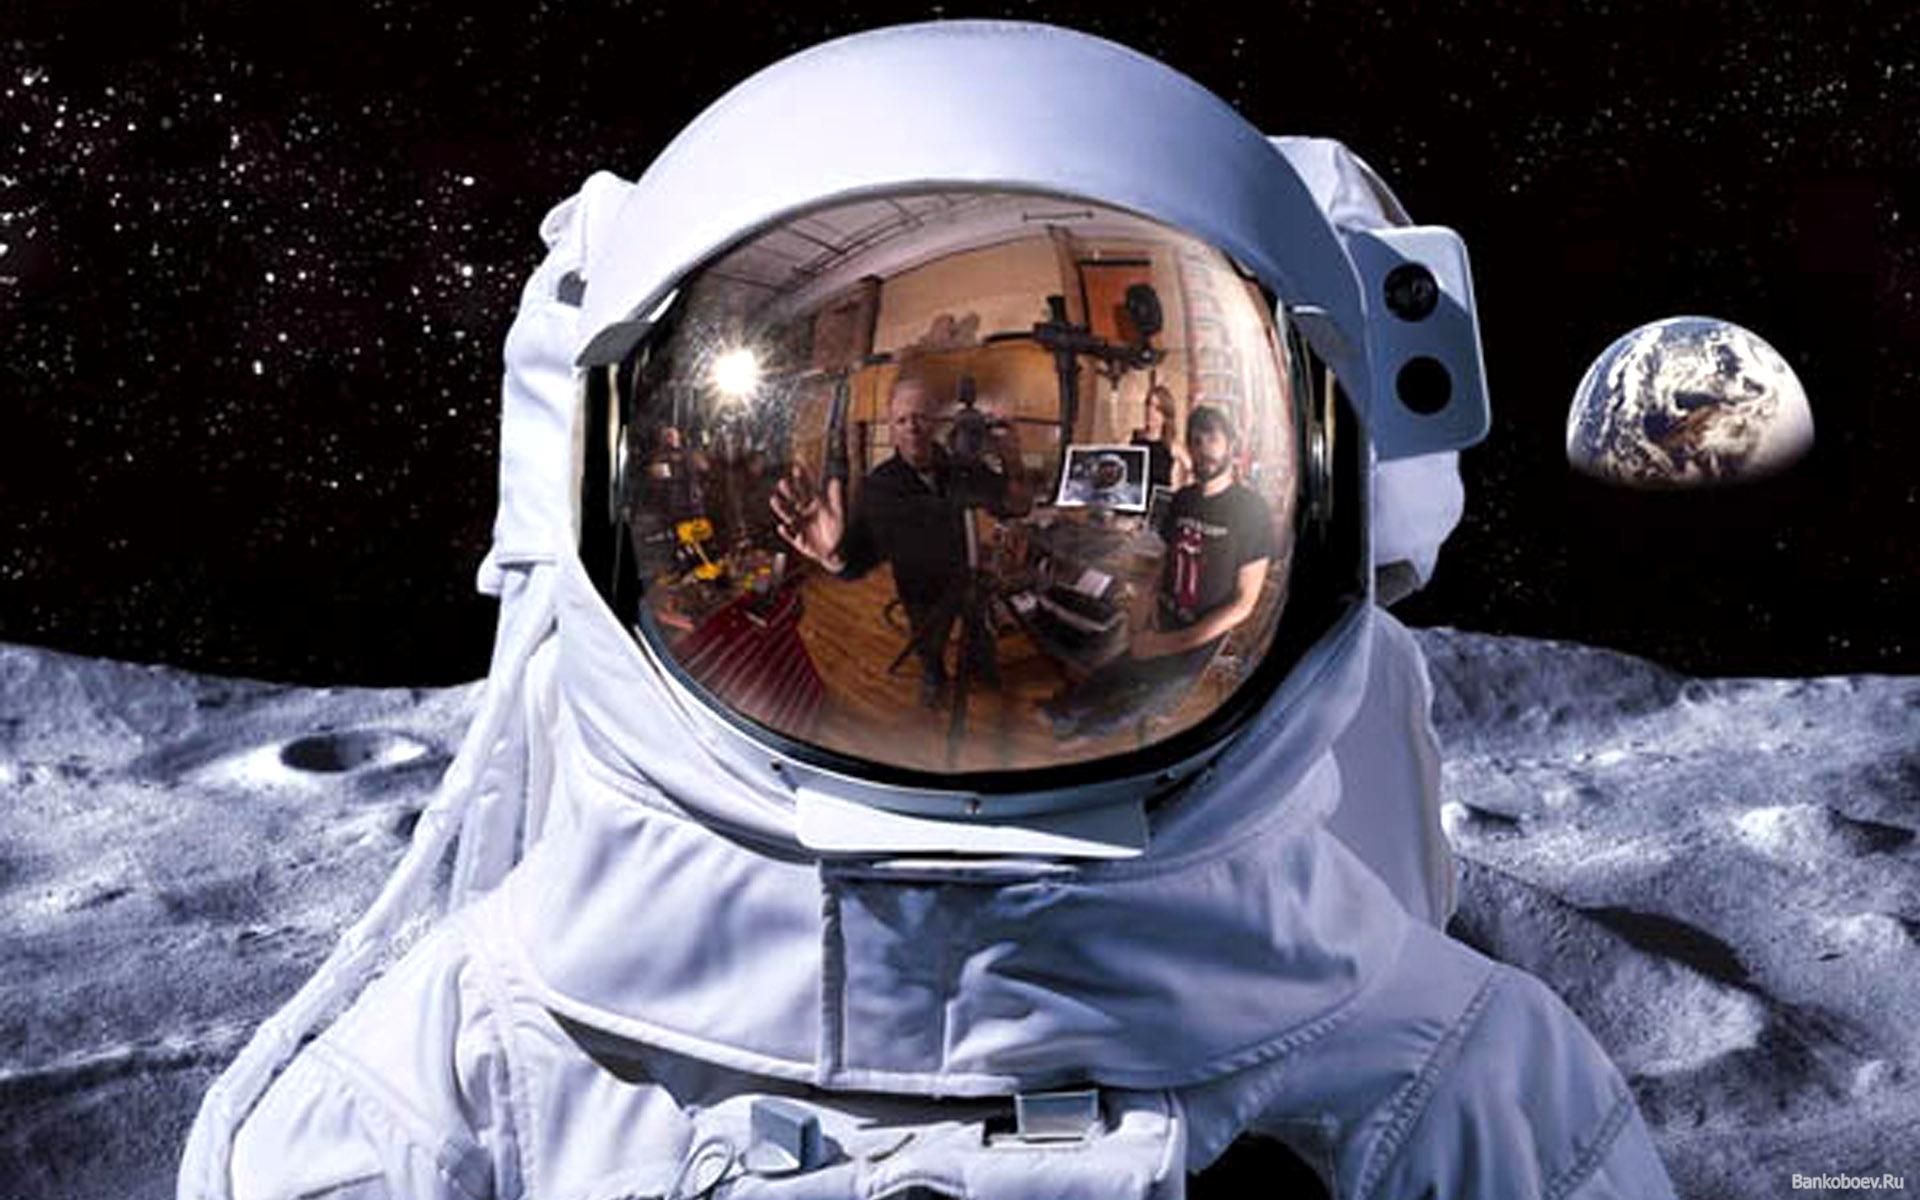 1513026008_e-news.su_bankoboev_ru_chto_videl_astronavt_na_lune